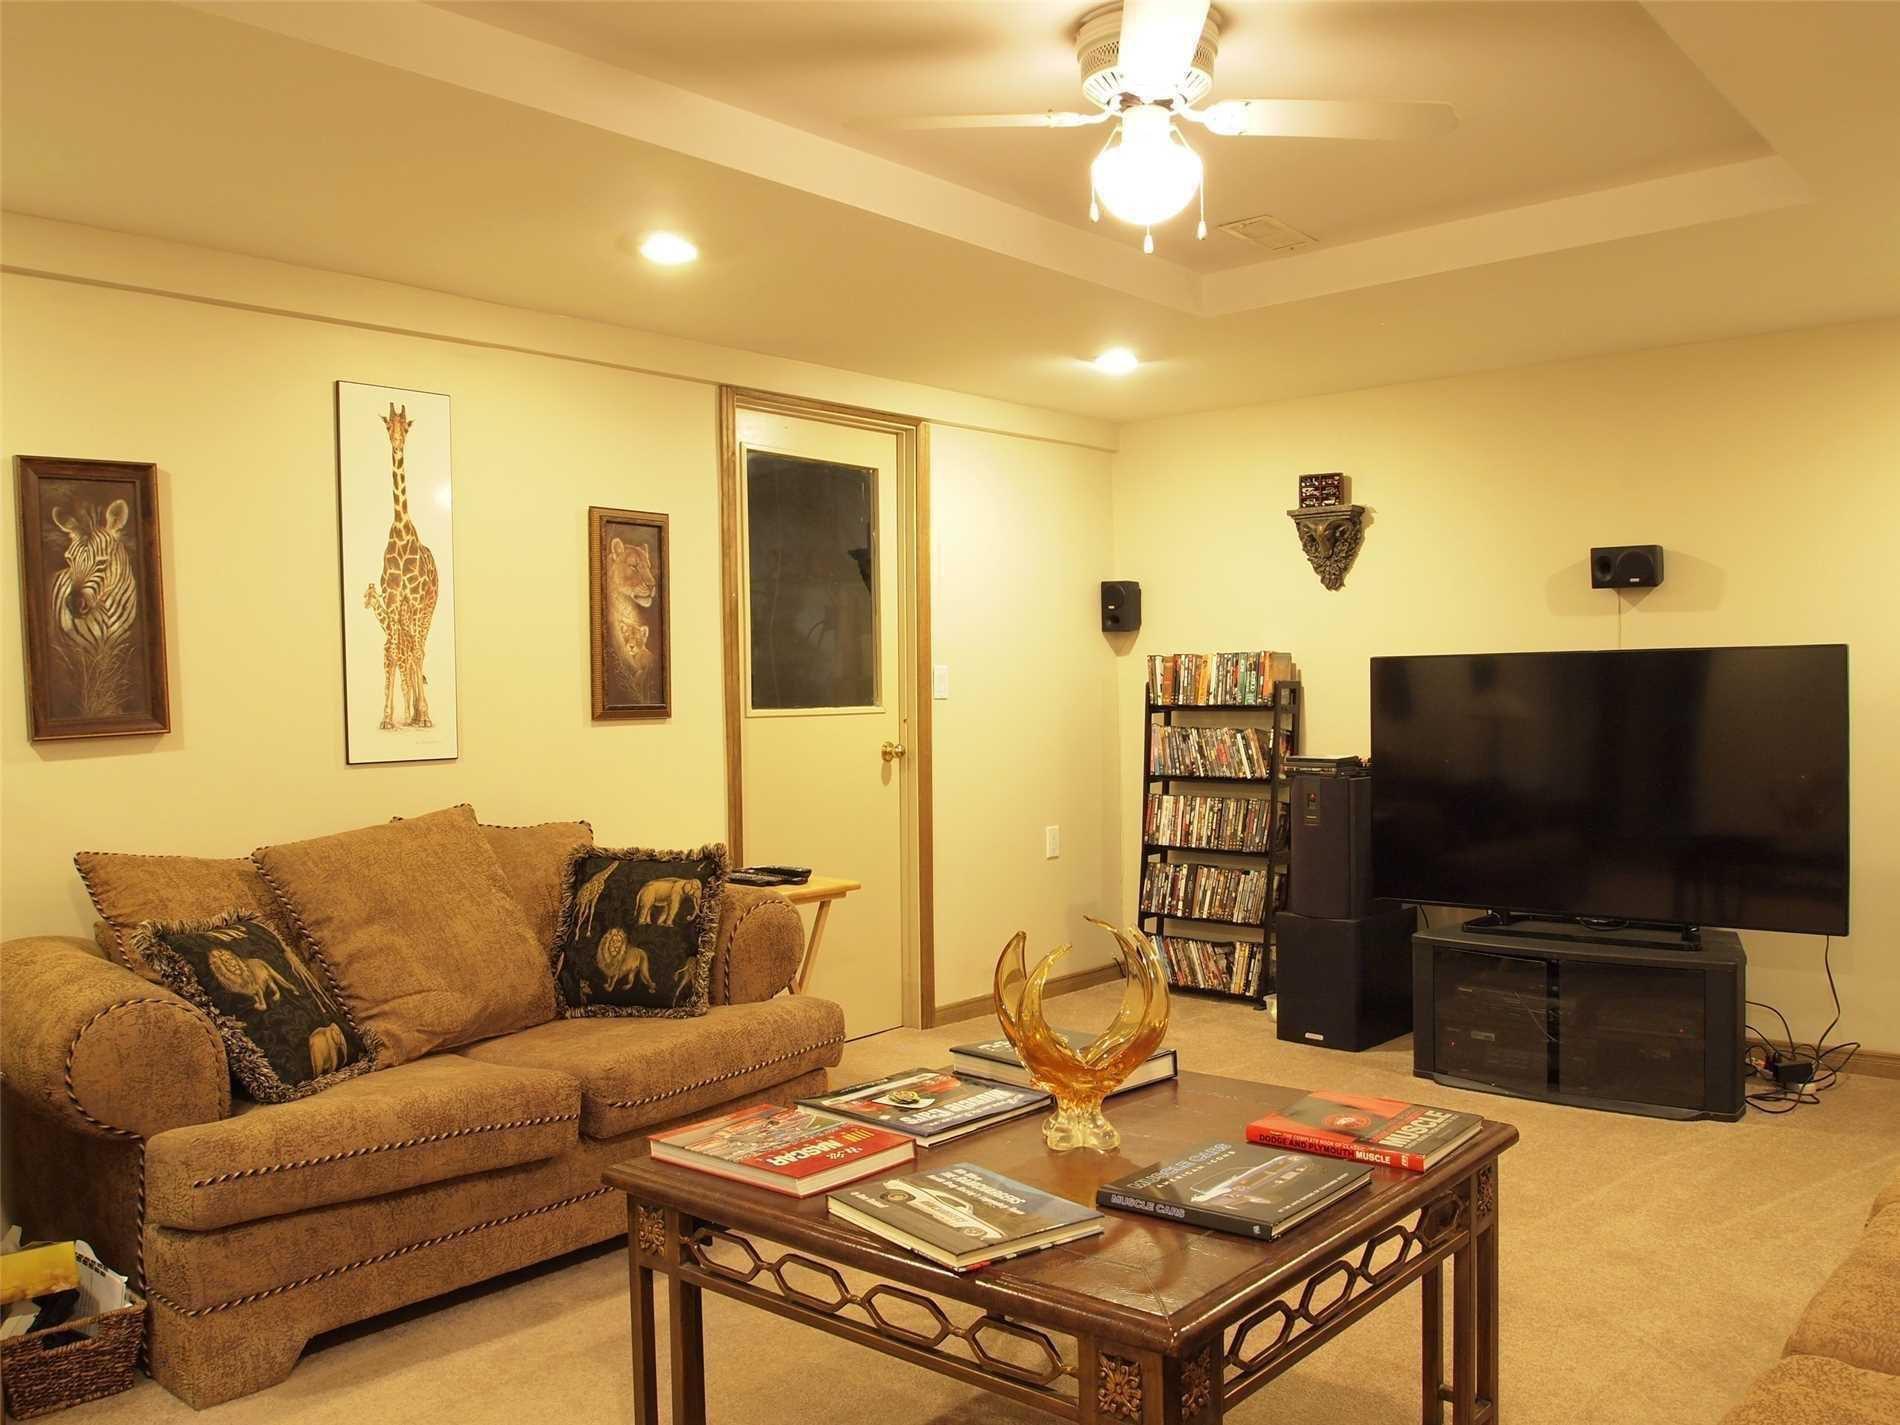 Photo 16: Photos: 105 Fifth Street in Brock: Beaverton House (Bungalow) for sale : MLS®# N4564596